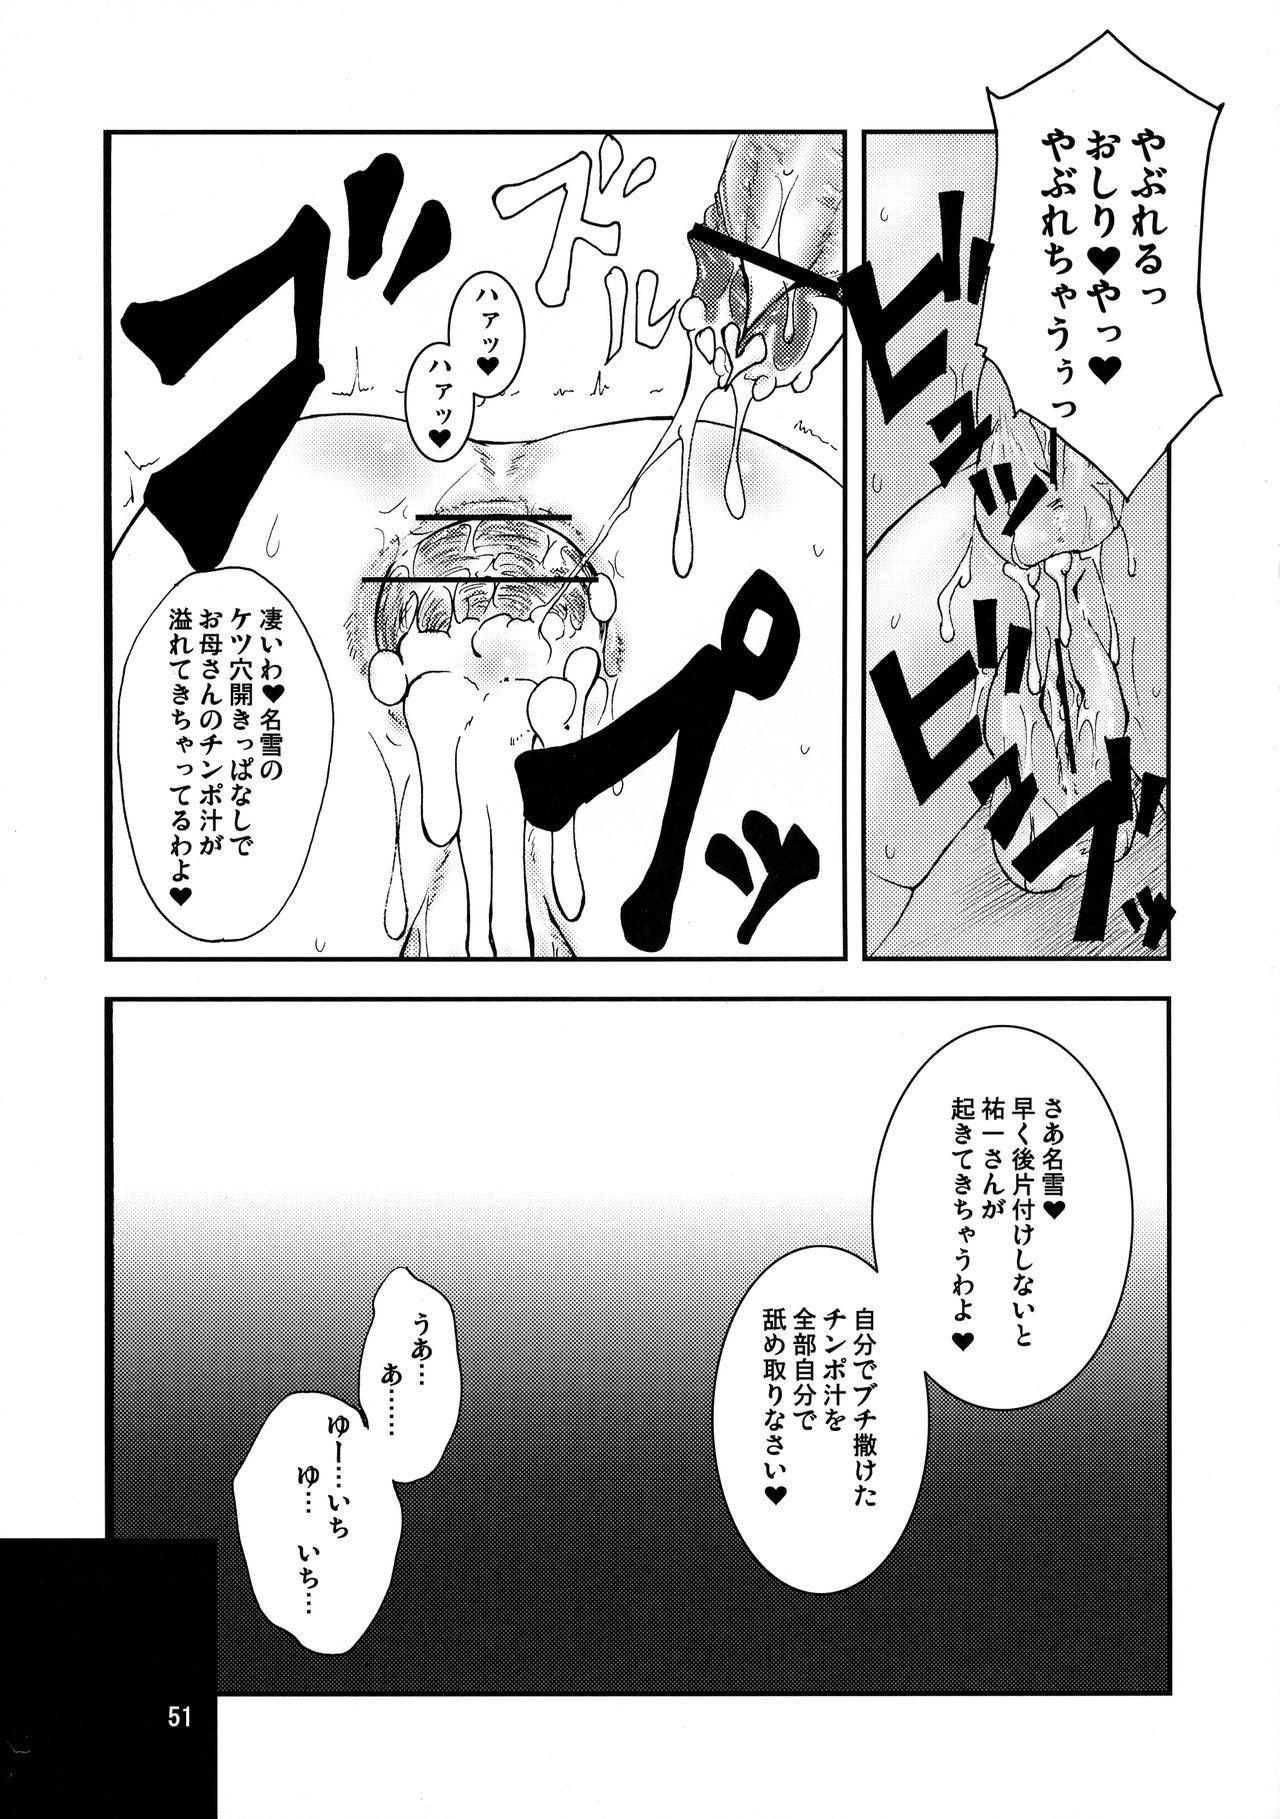 Kyouki Vol. 3~5 Remake Ver. 50